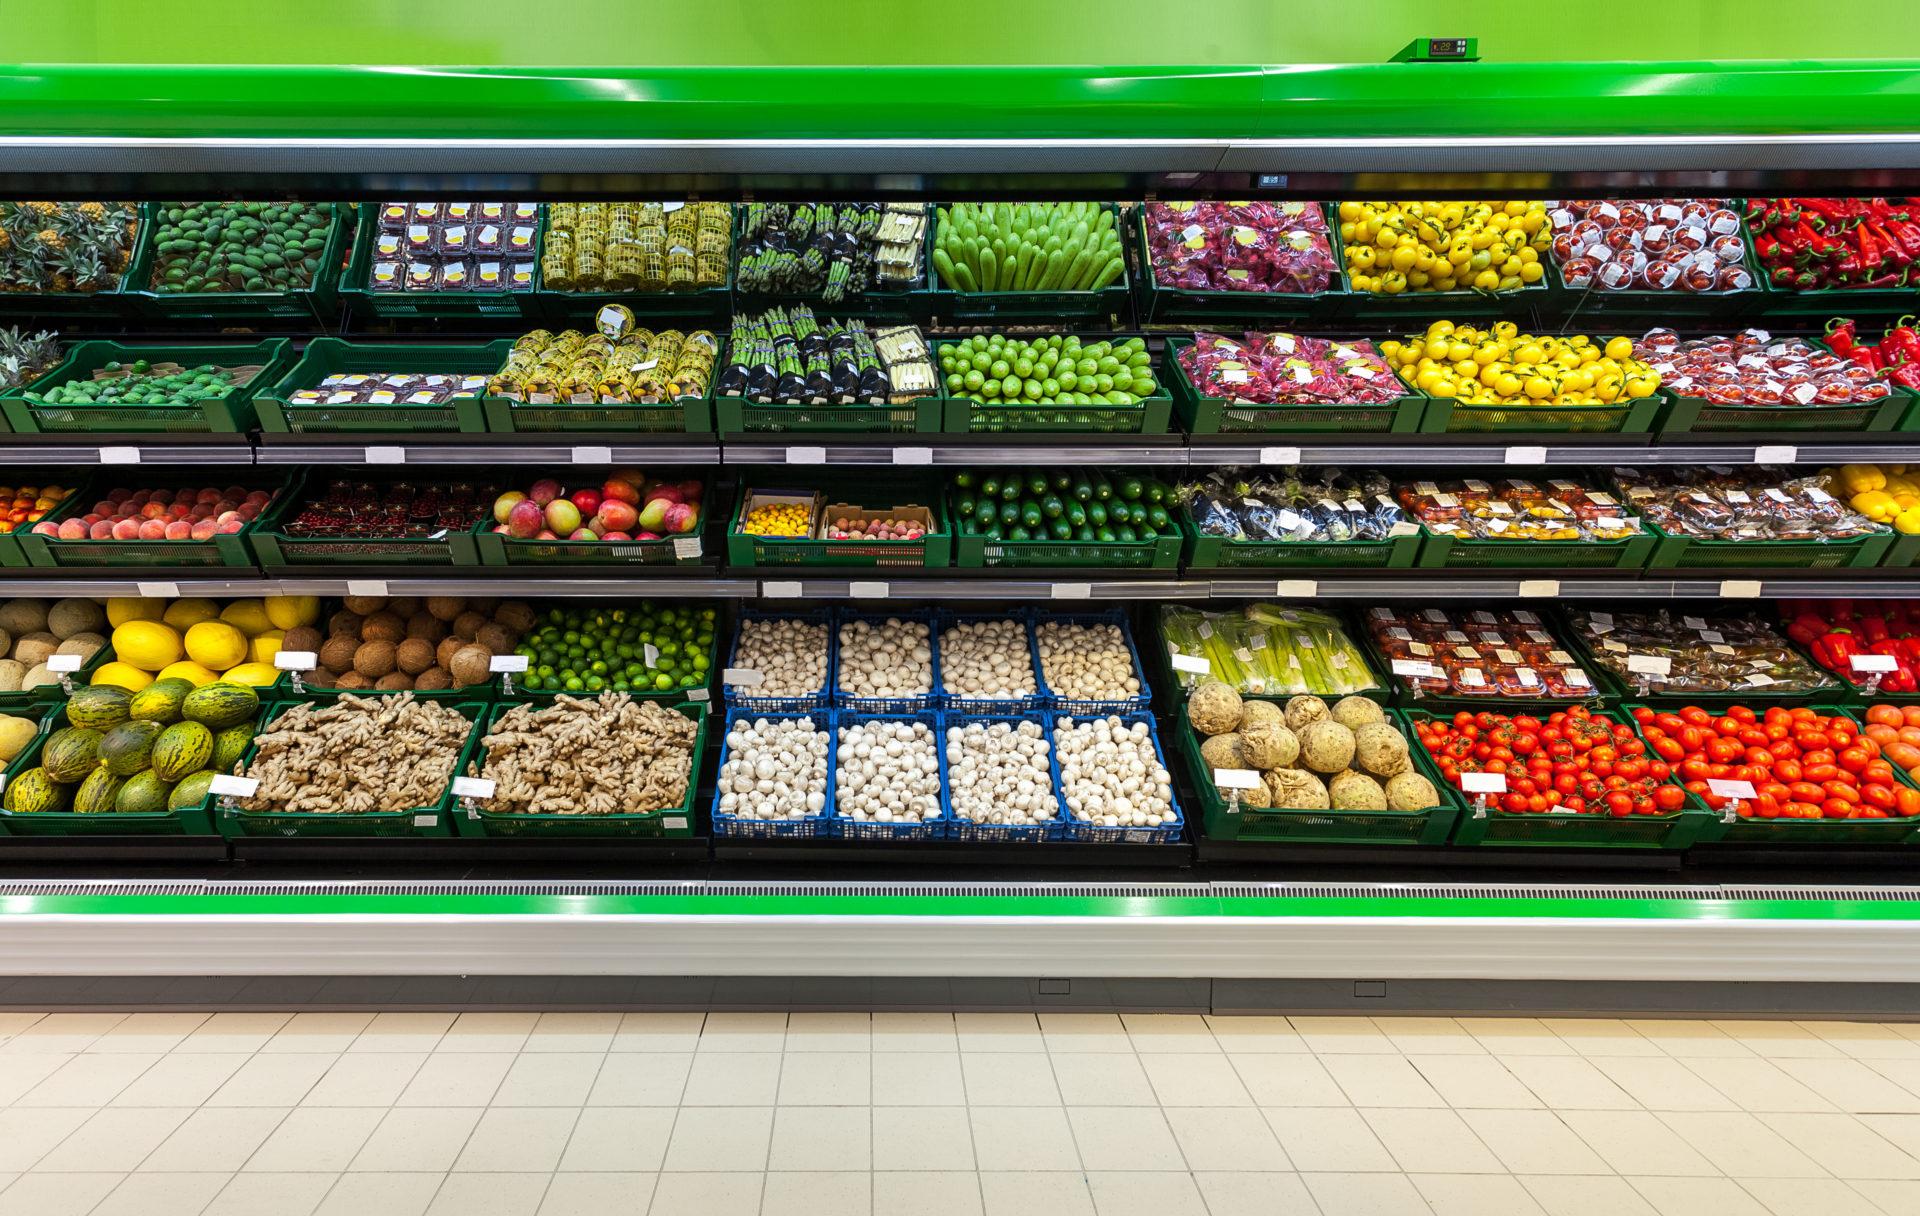 Regional Supermarket Chain Focuses on Vendor Management